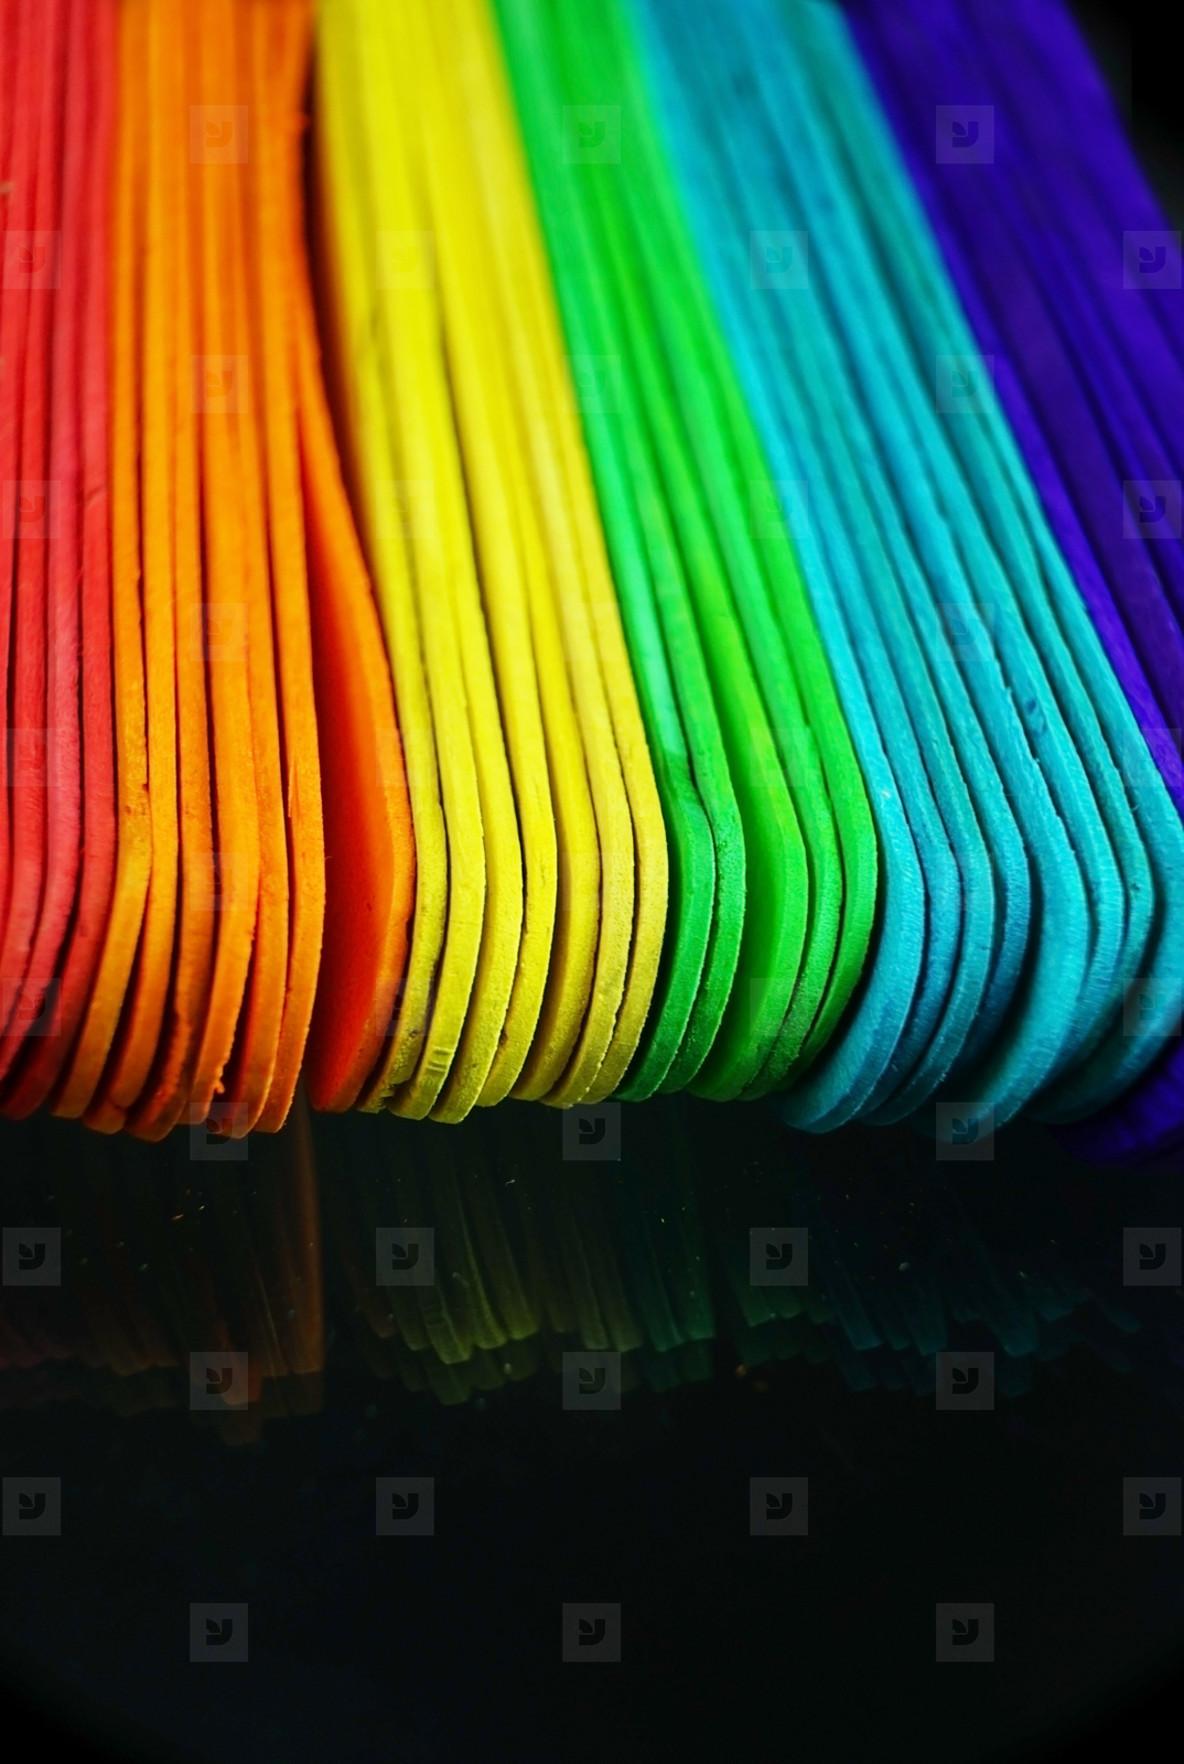 Wood sticks colorful background